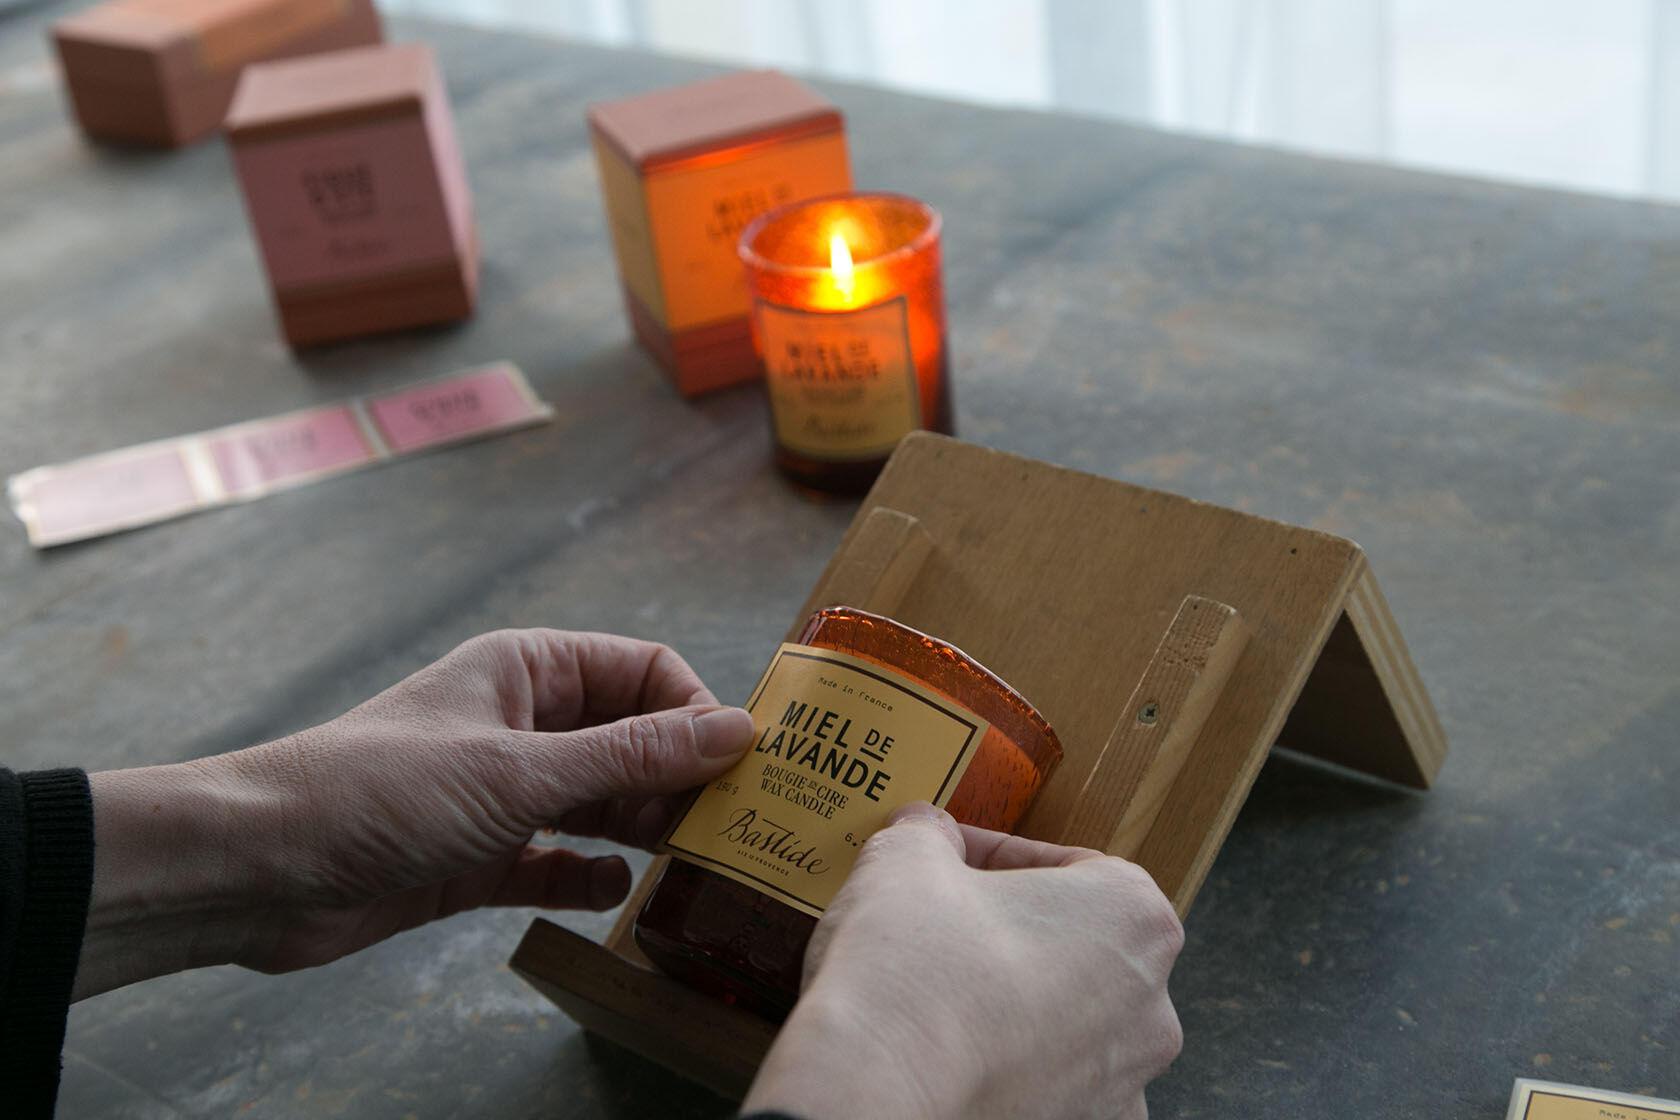 Provence Bastide Luxury Beauty Brand Candles